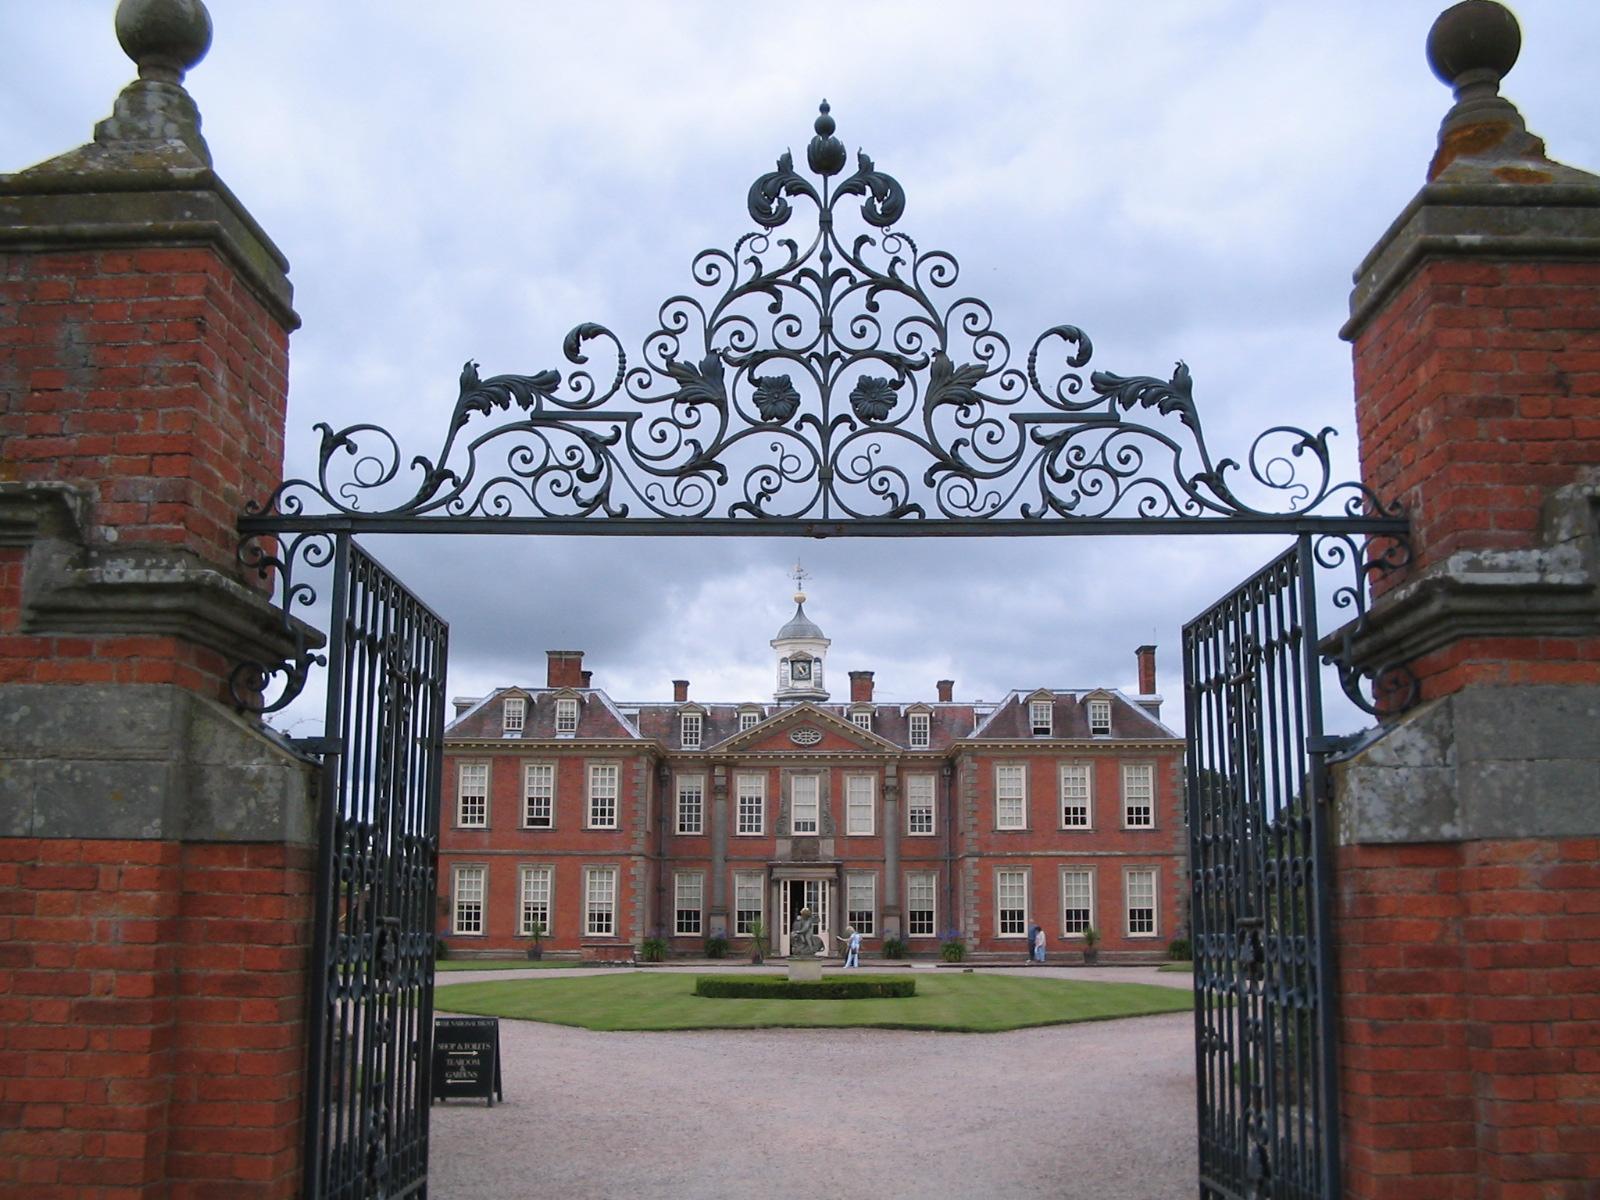 Hanbury Hall Orangery Hanbury Hall as Seen Through